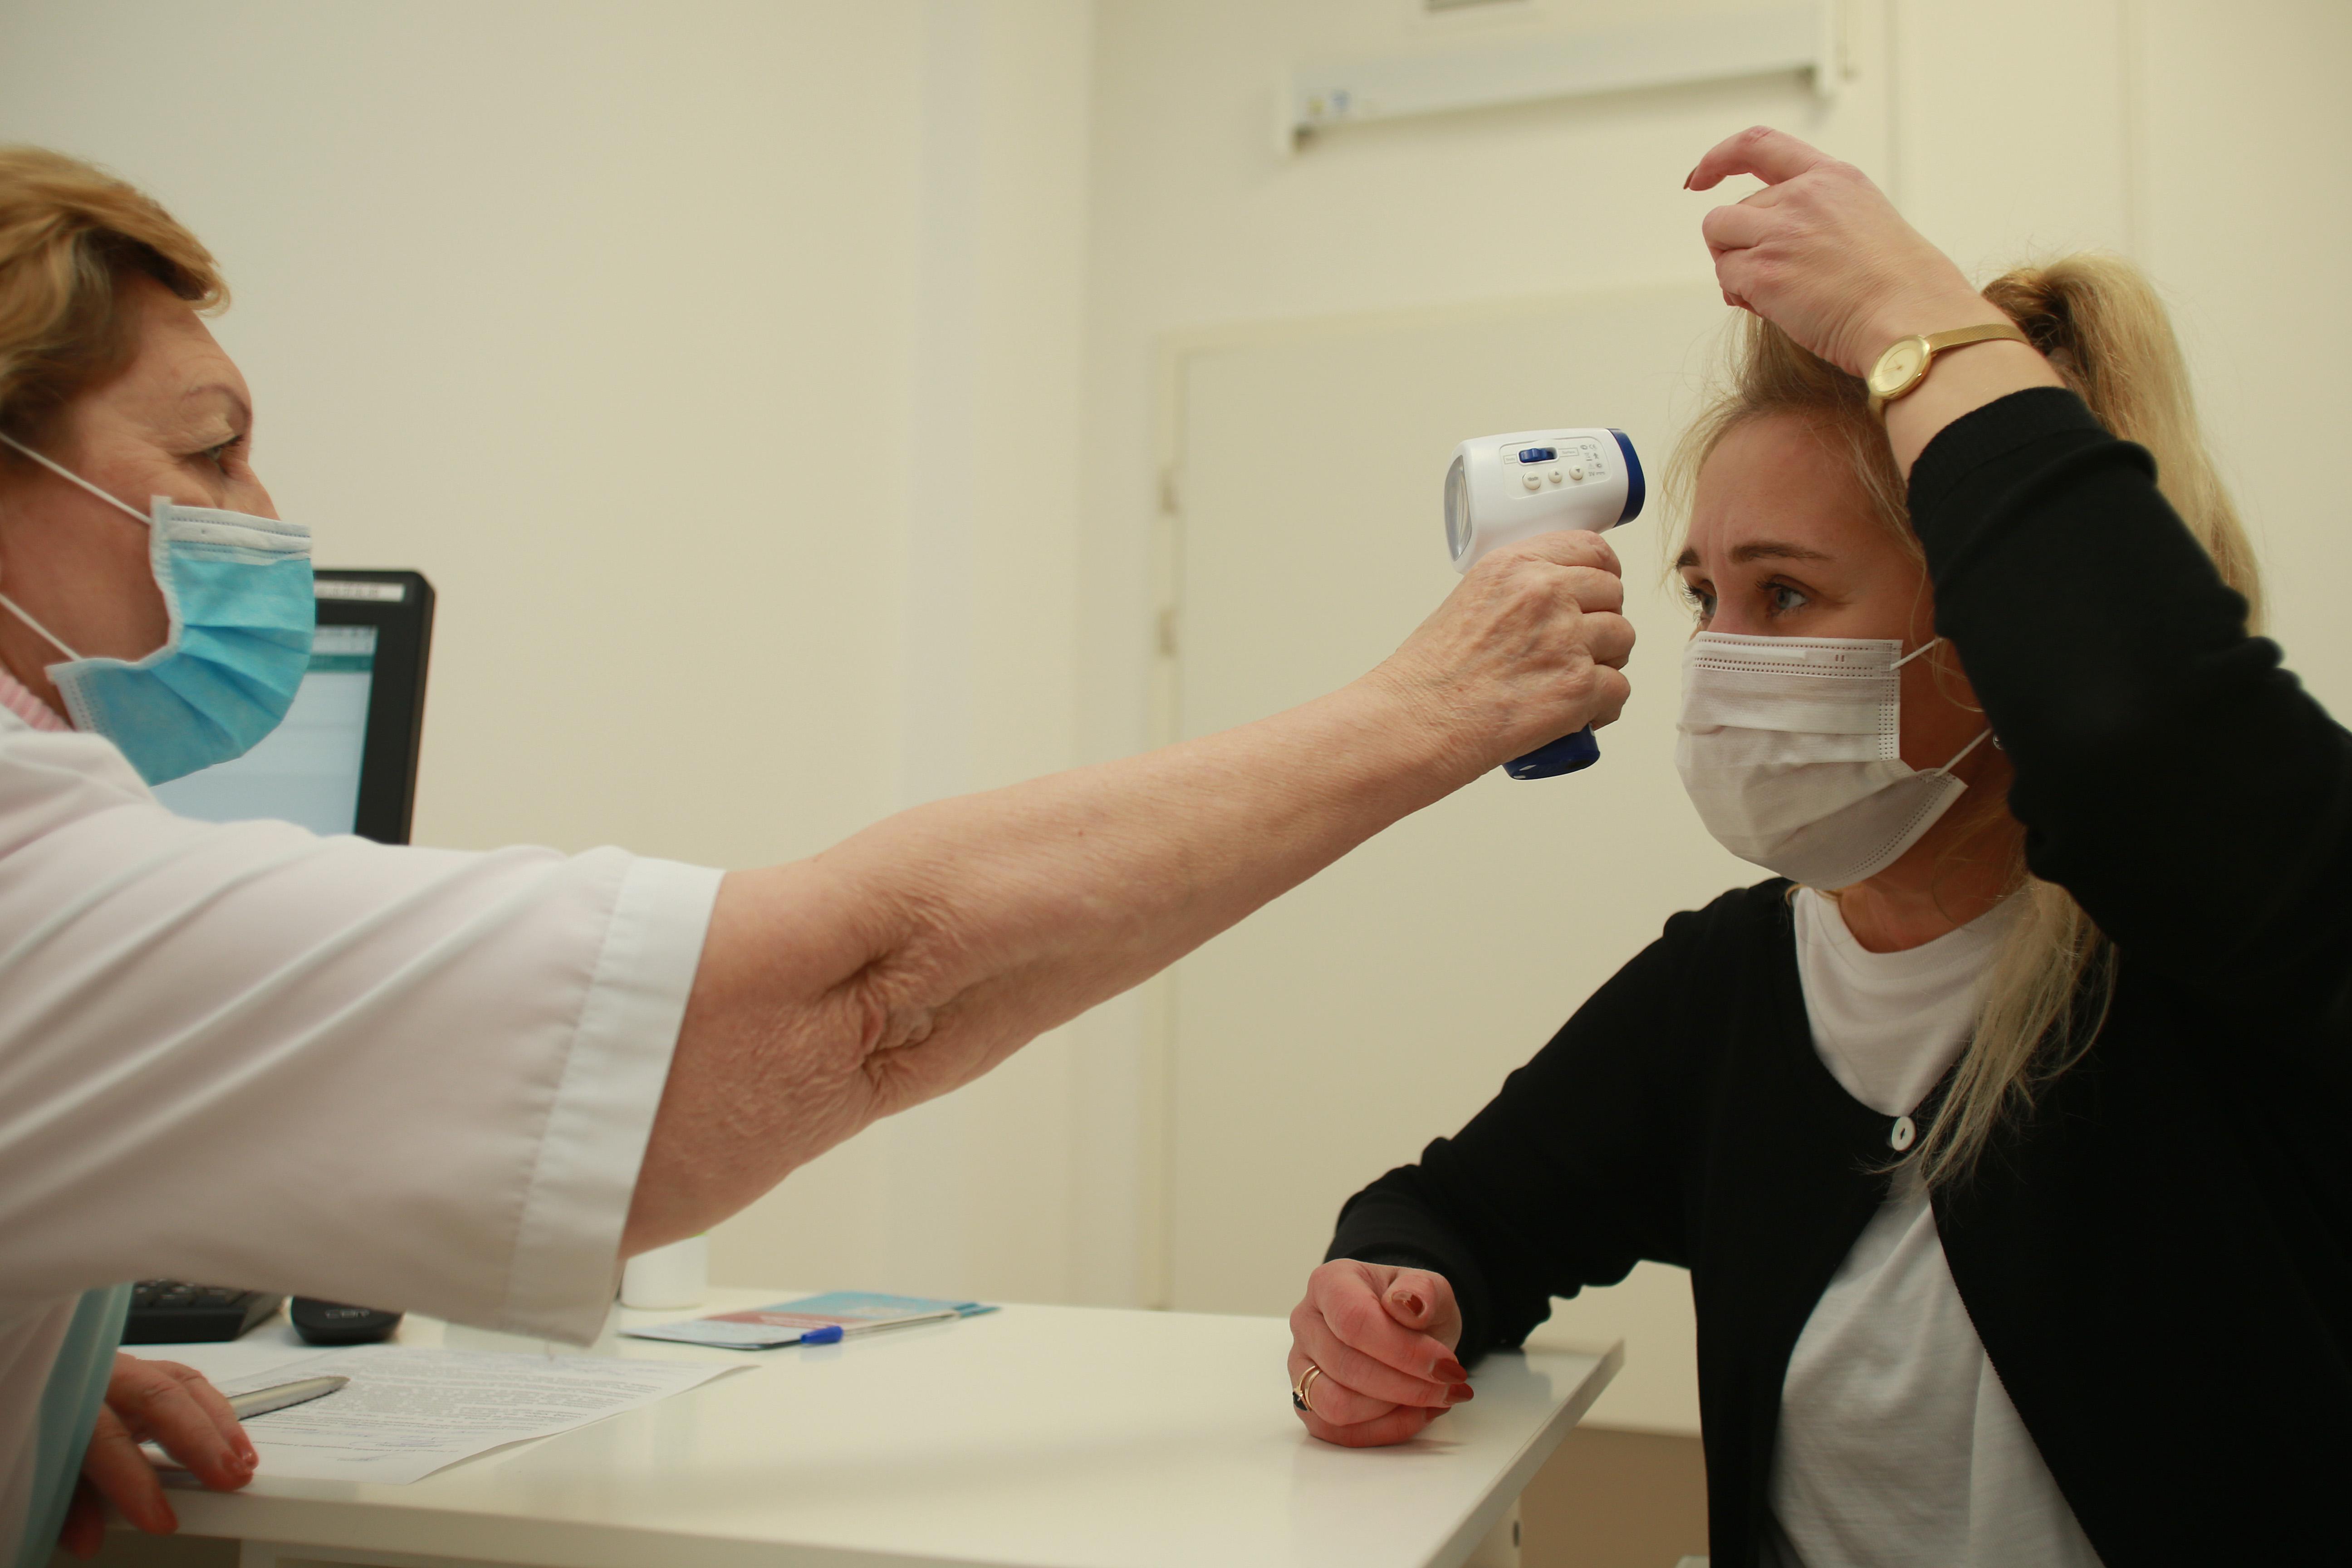 Прививку от COVID-19 с понедельника смогут сделать москвичи старше 60 лет. Фото: Наталия Нечаева, «Вечерняя Москва»